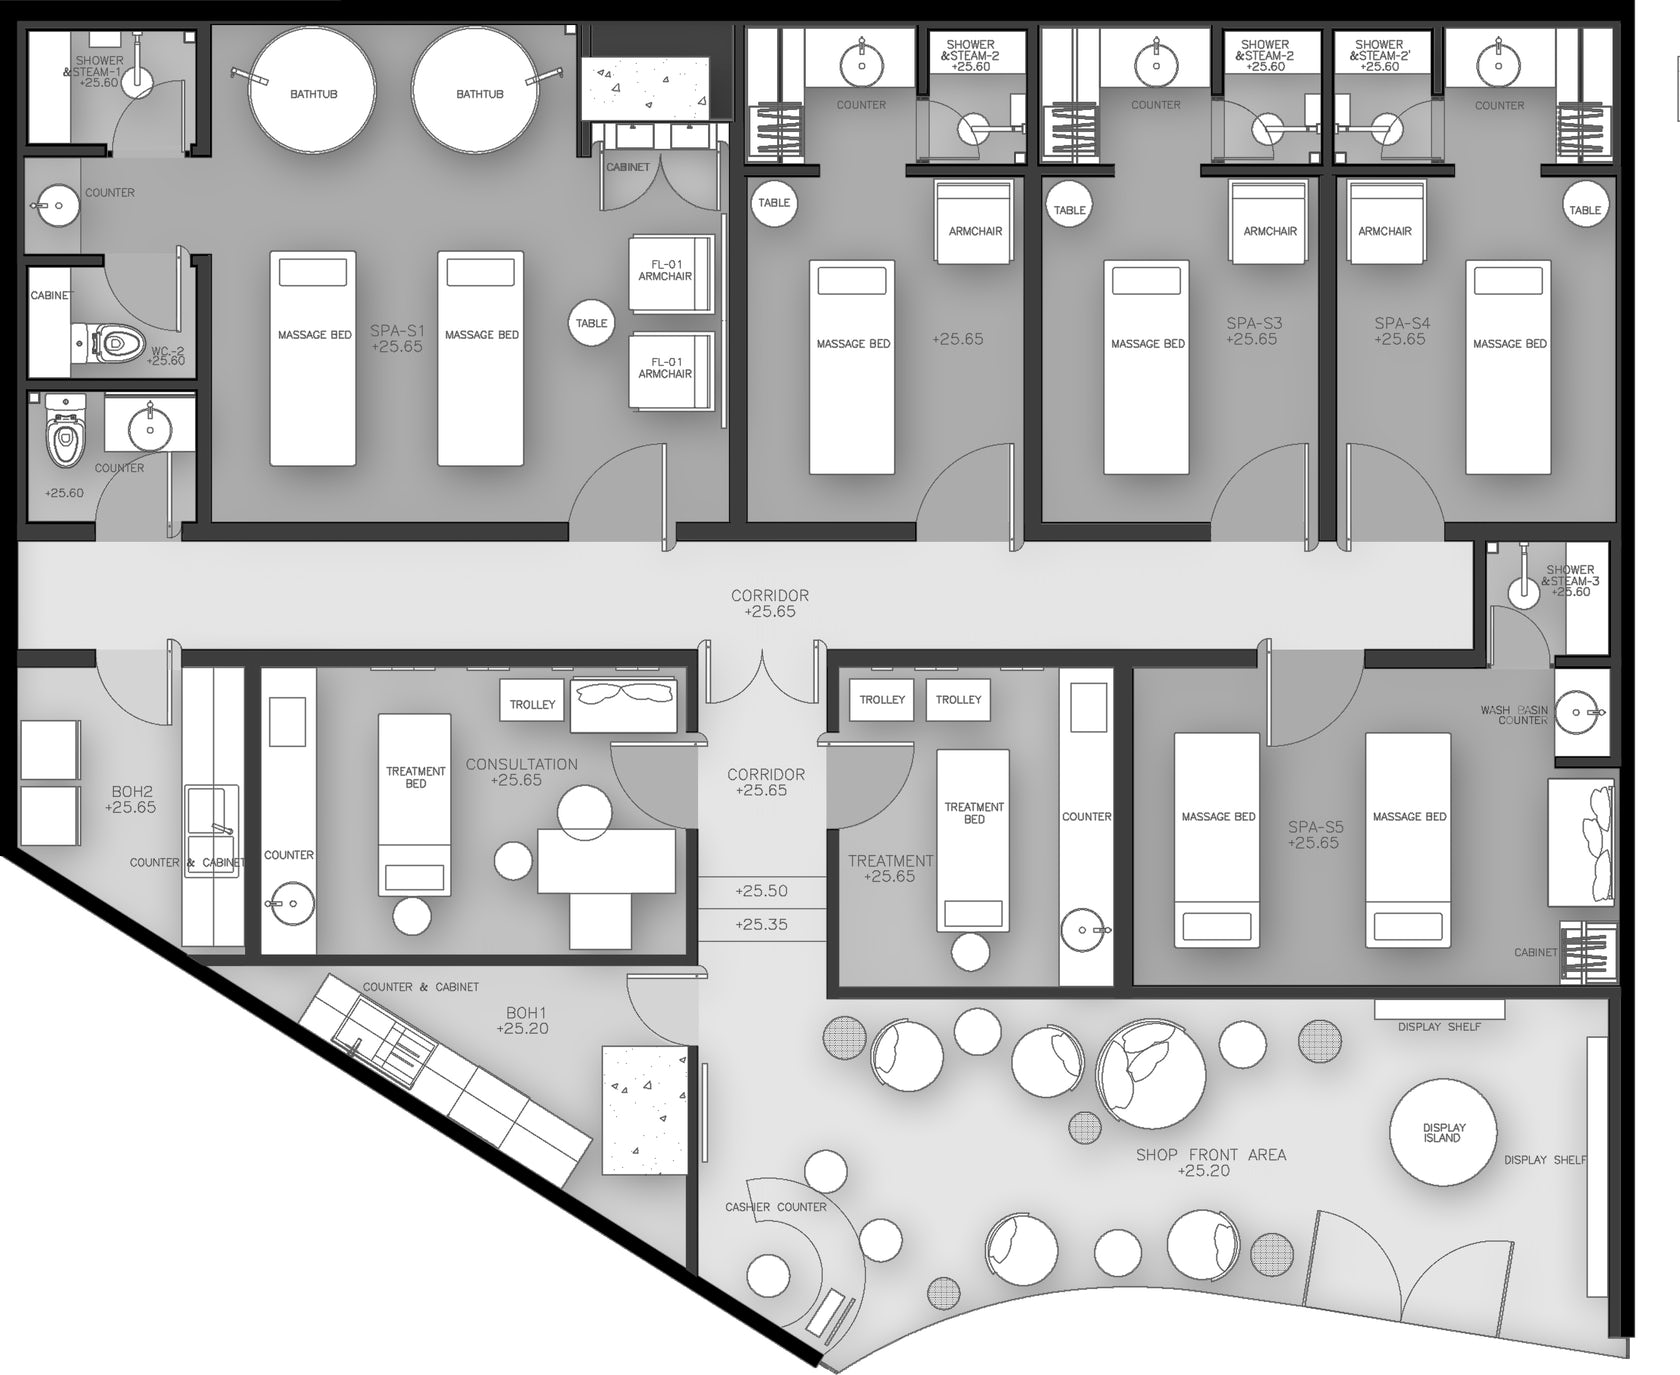 Dii wellness med spa architizer for Spa floor plan design